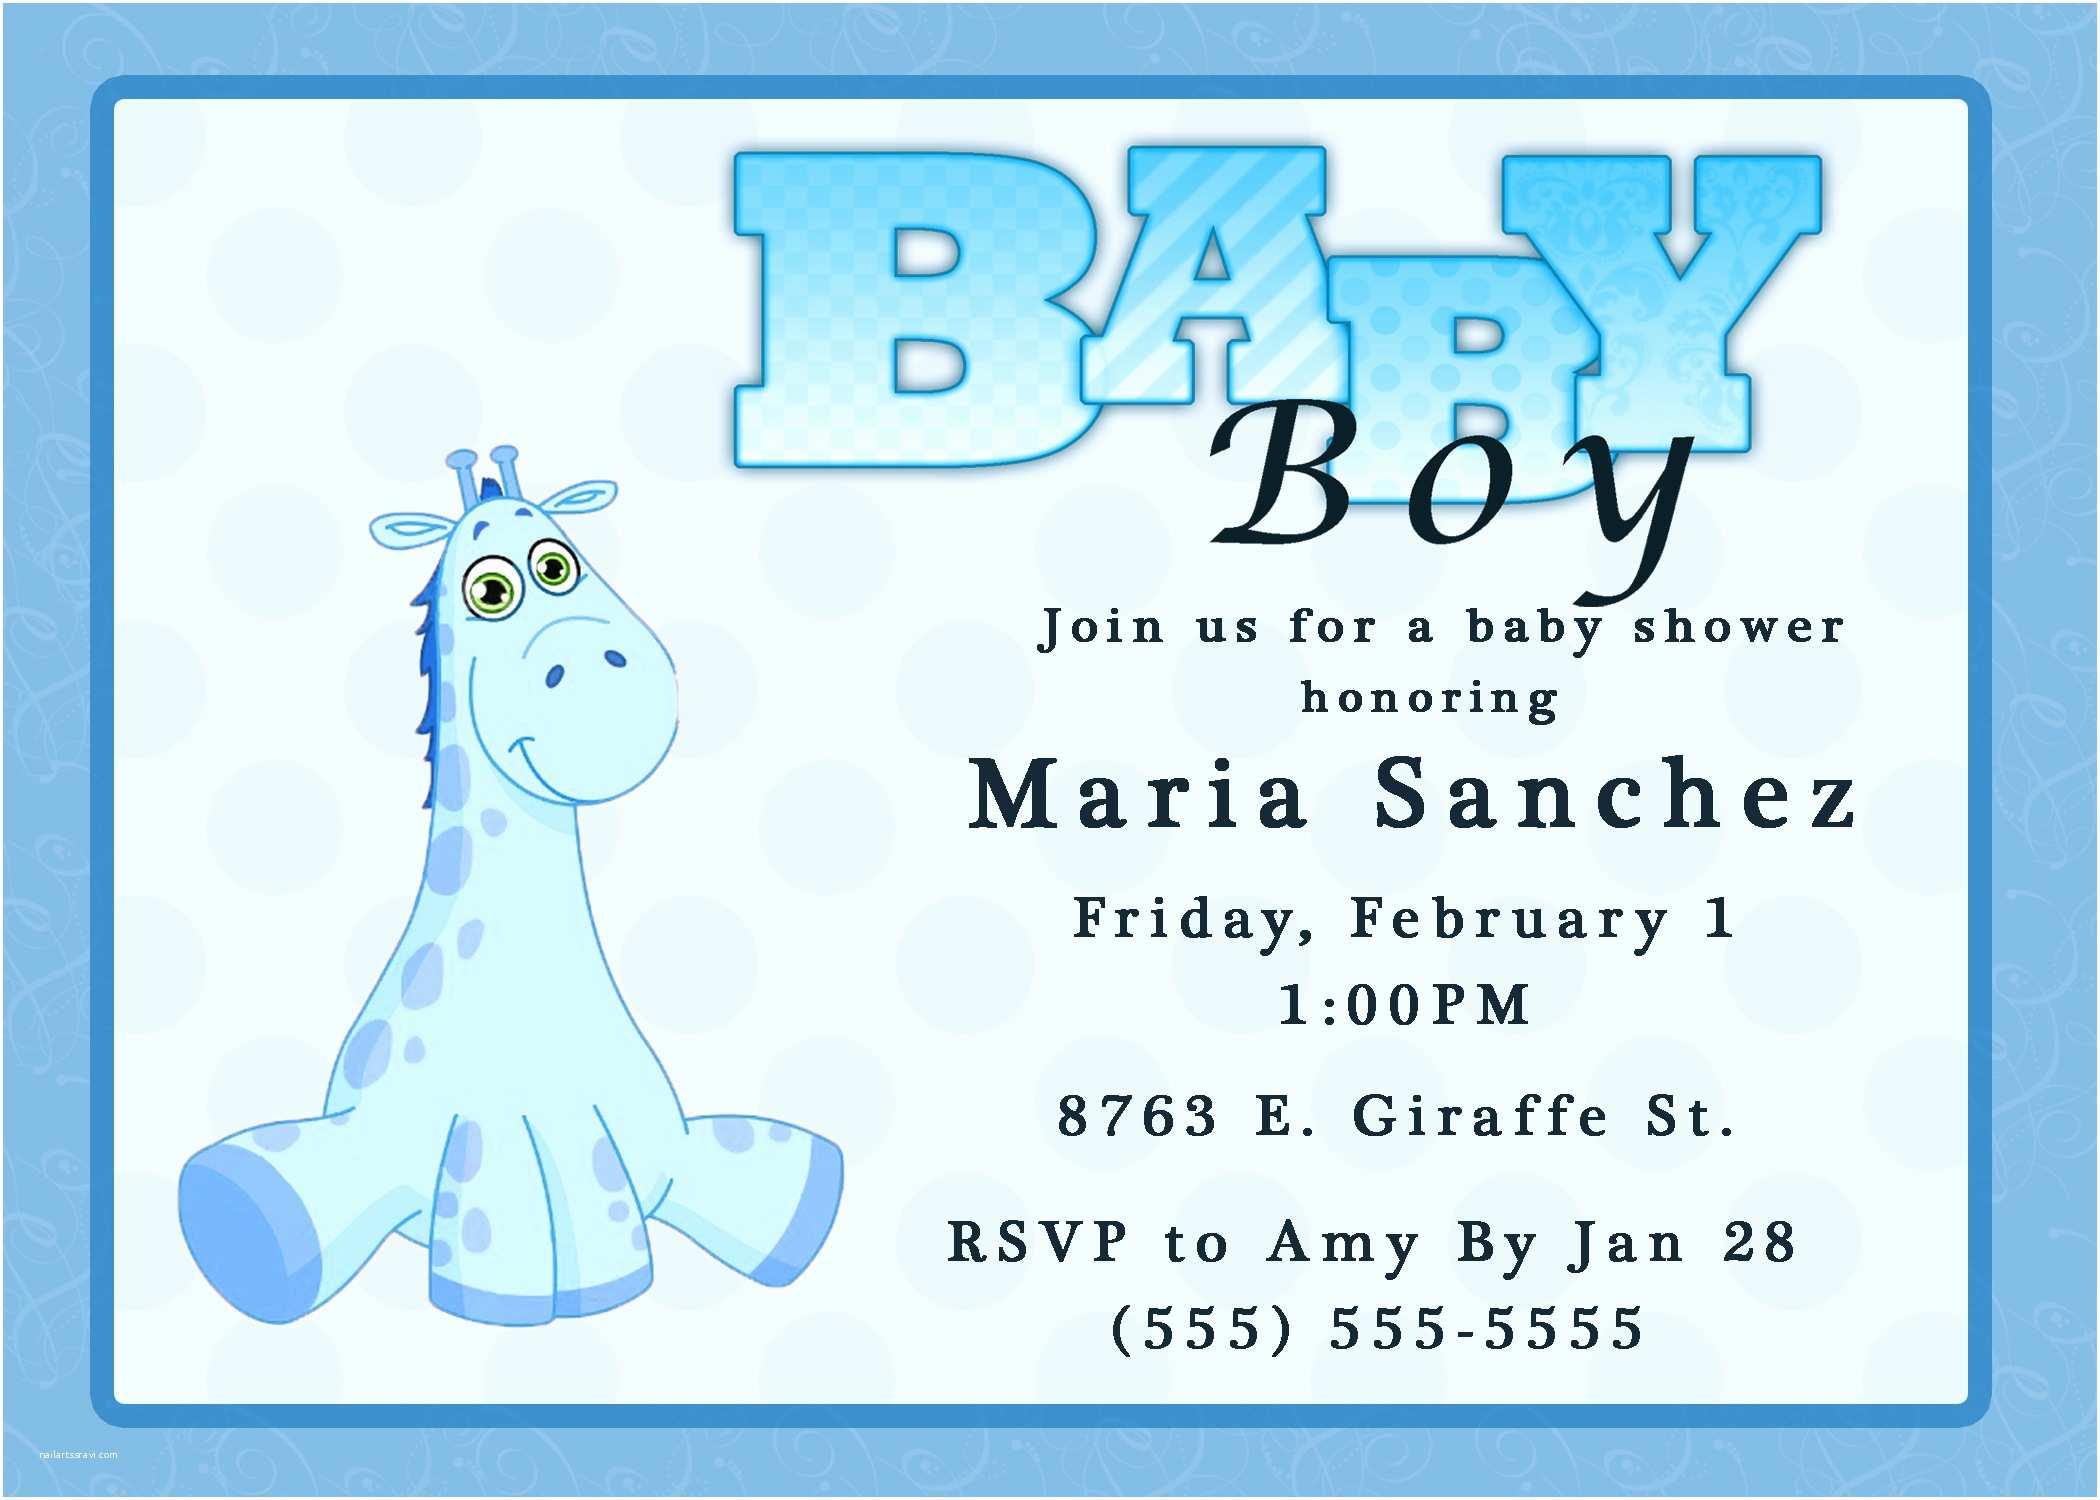 Baby Shower Invitation Message Baby Boy Shower Invitation Wording Ideas